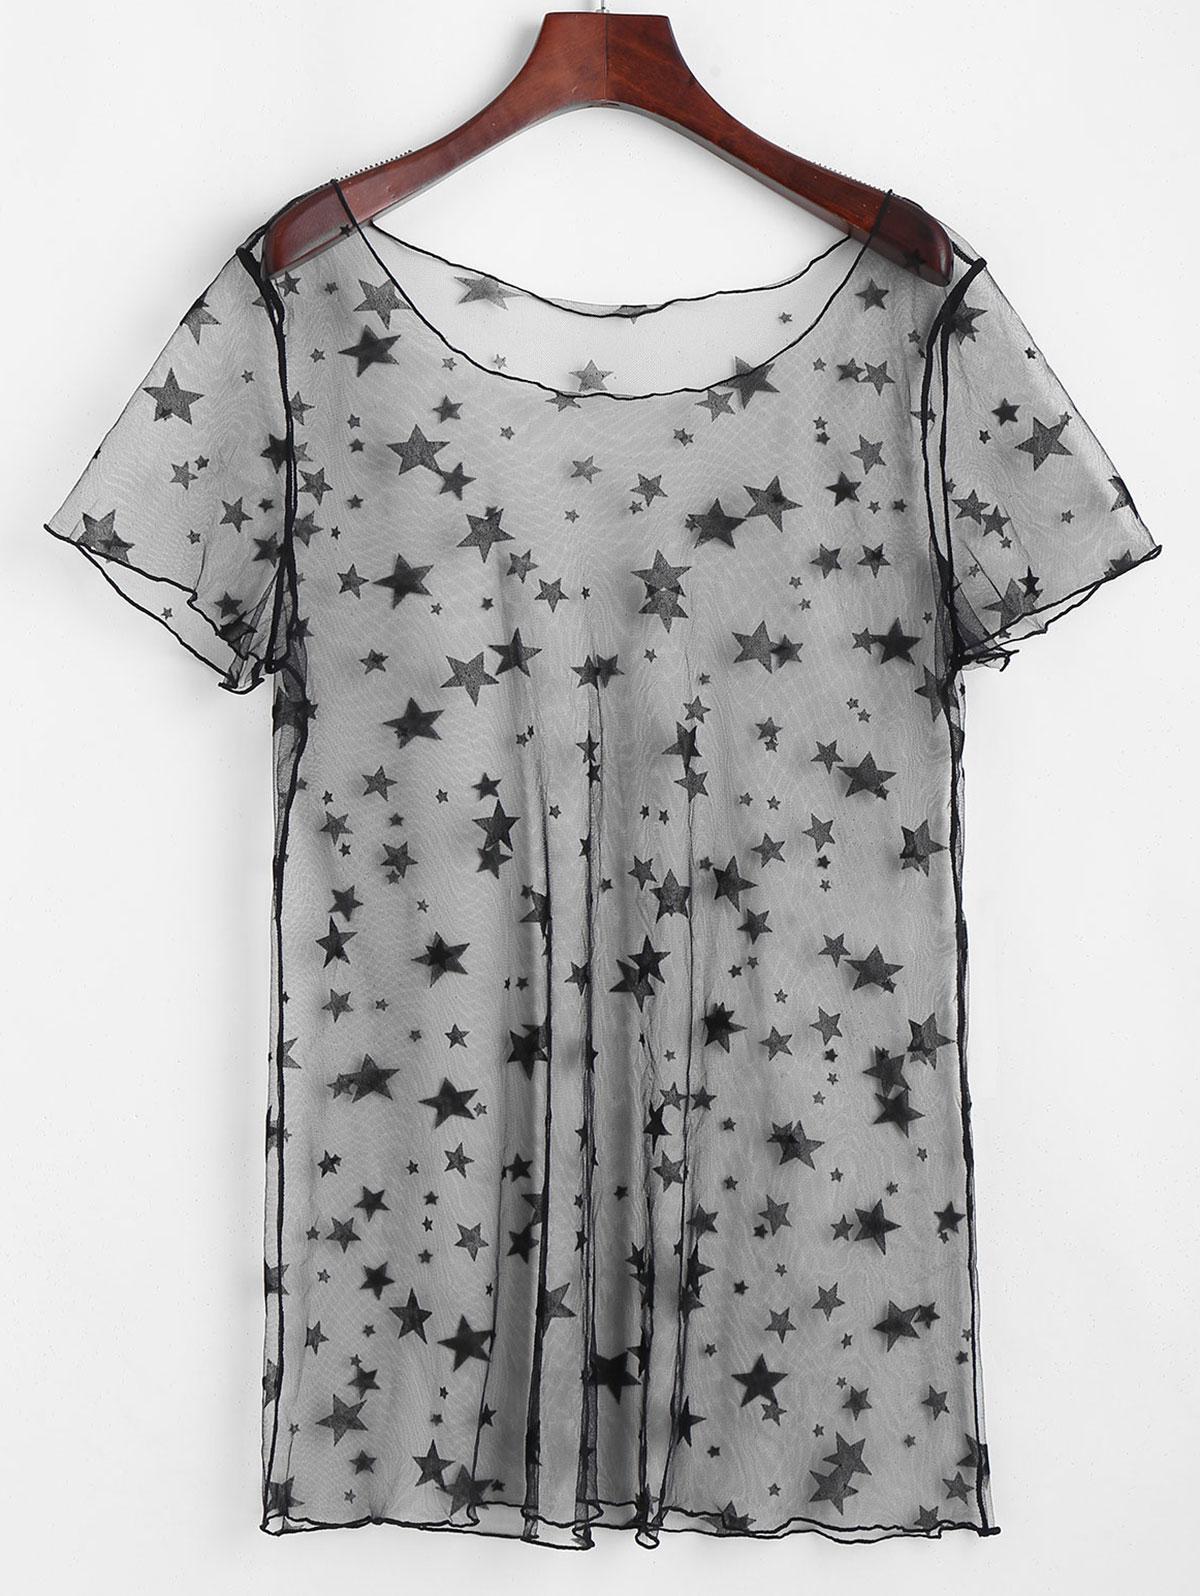 ZAFUL Star Lace See Thru Tunic Cover Up Dress